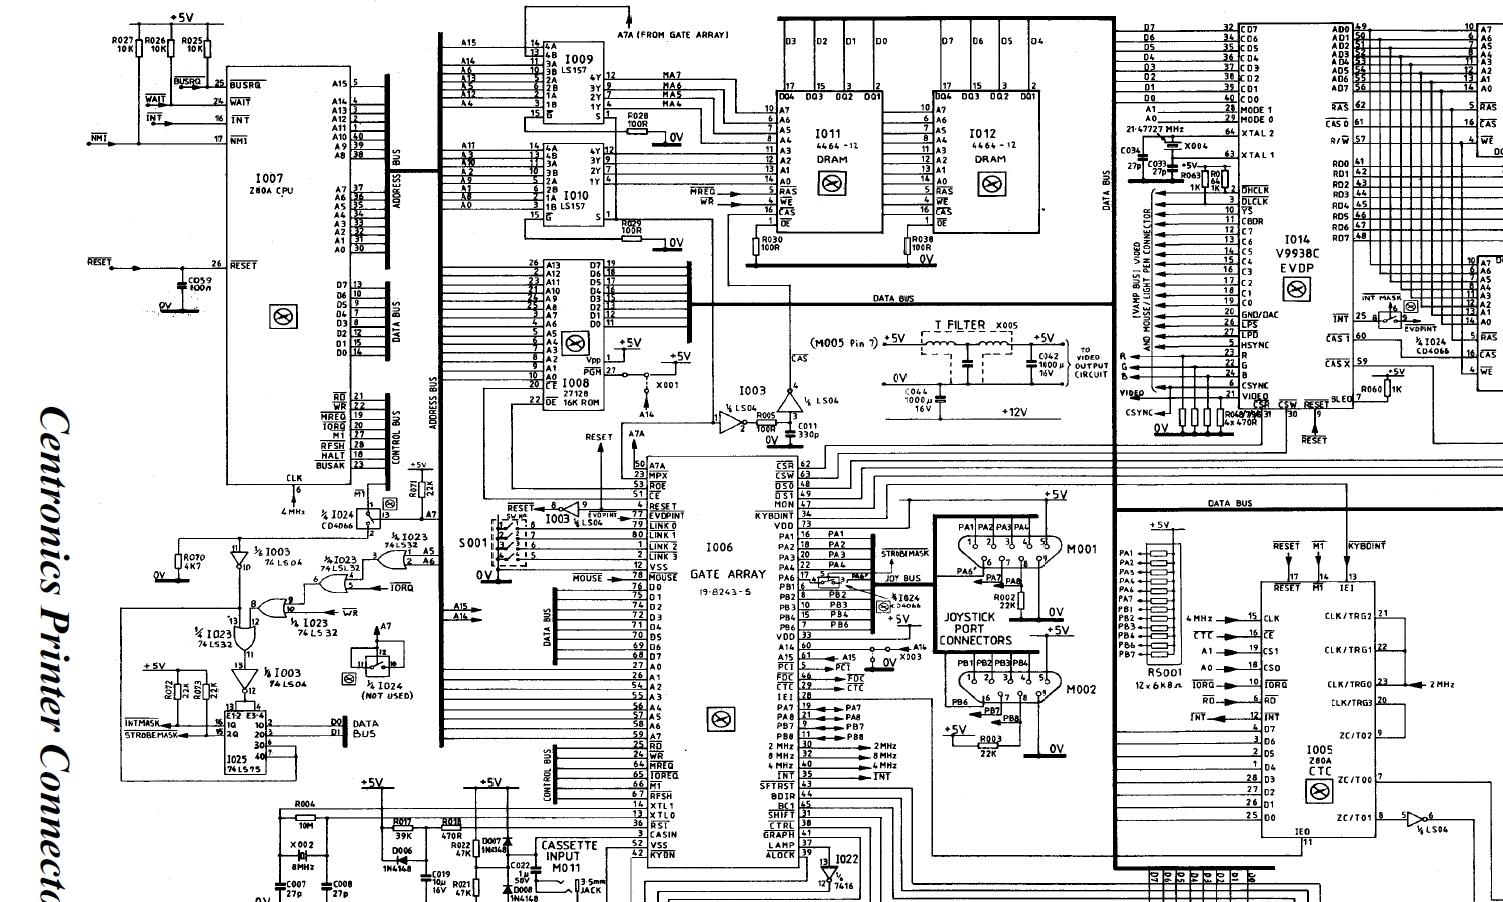 Mikrokomputer cobra 1 7 elektroda mikrokomputer cobra 1 ccuart Gallery